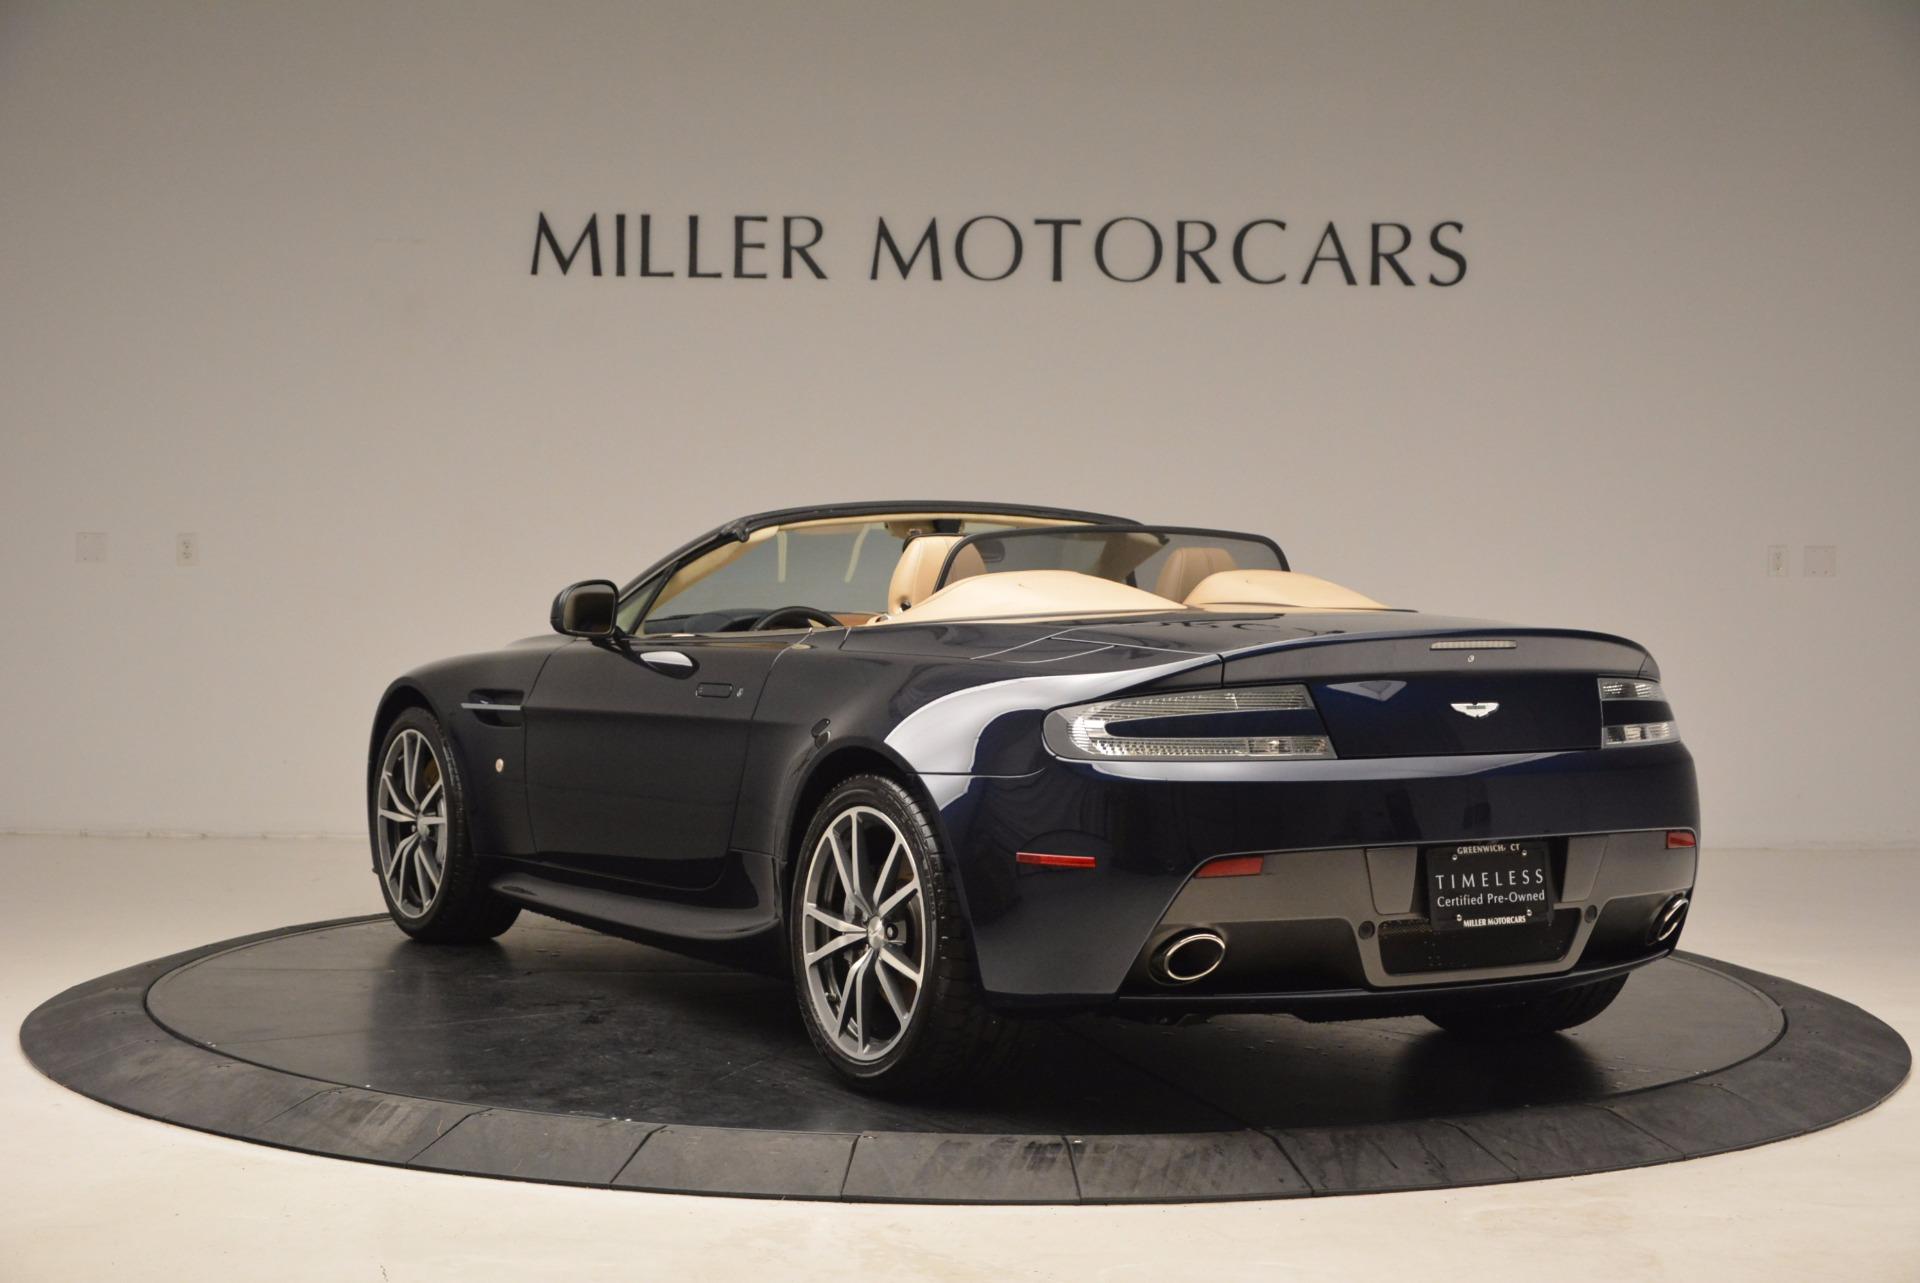 Used 2014 Aston Martin V8 Vantage Roadster For Sale In Westport, CT 1623_p5